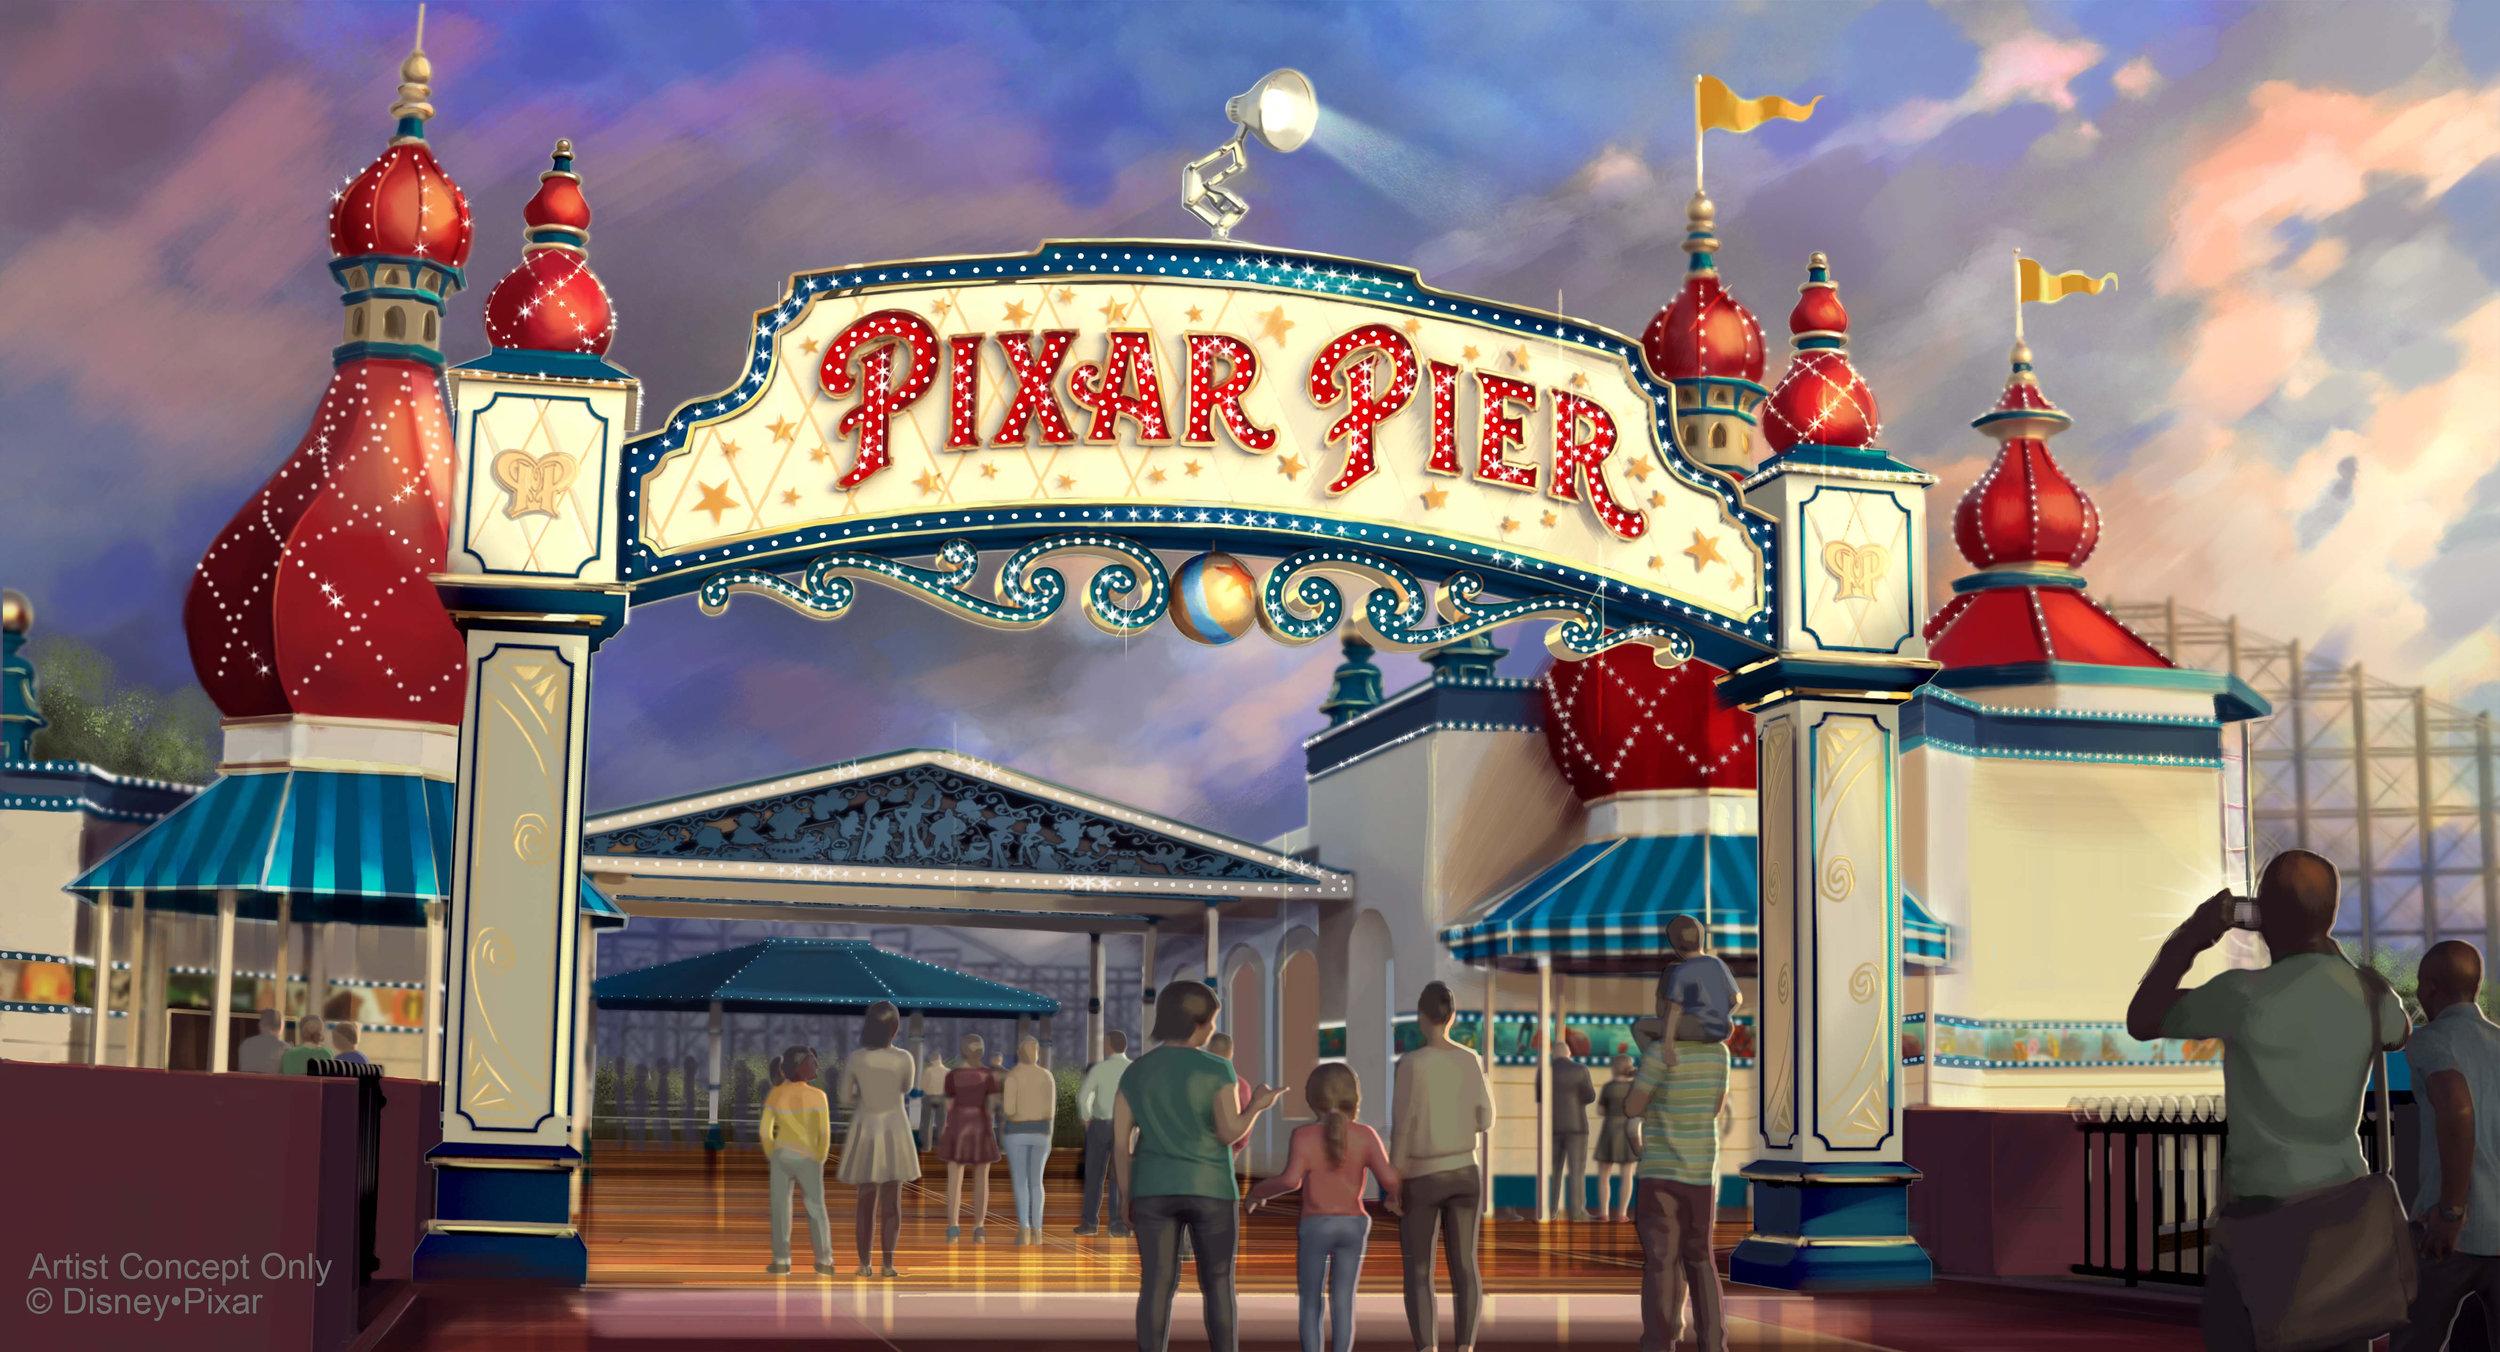 Image_DLR_Pixar-Pier-Marquee.jpg